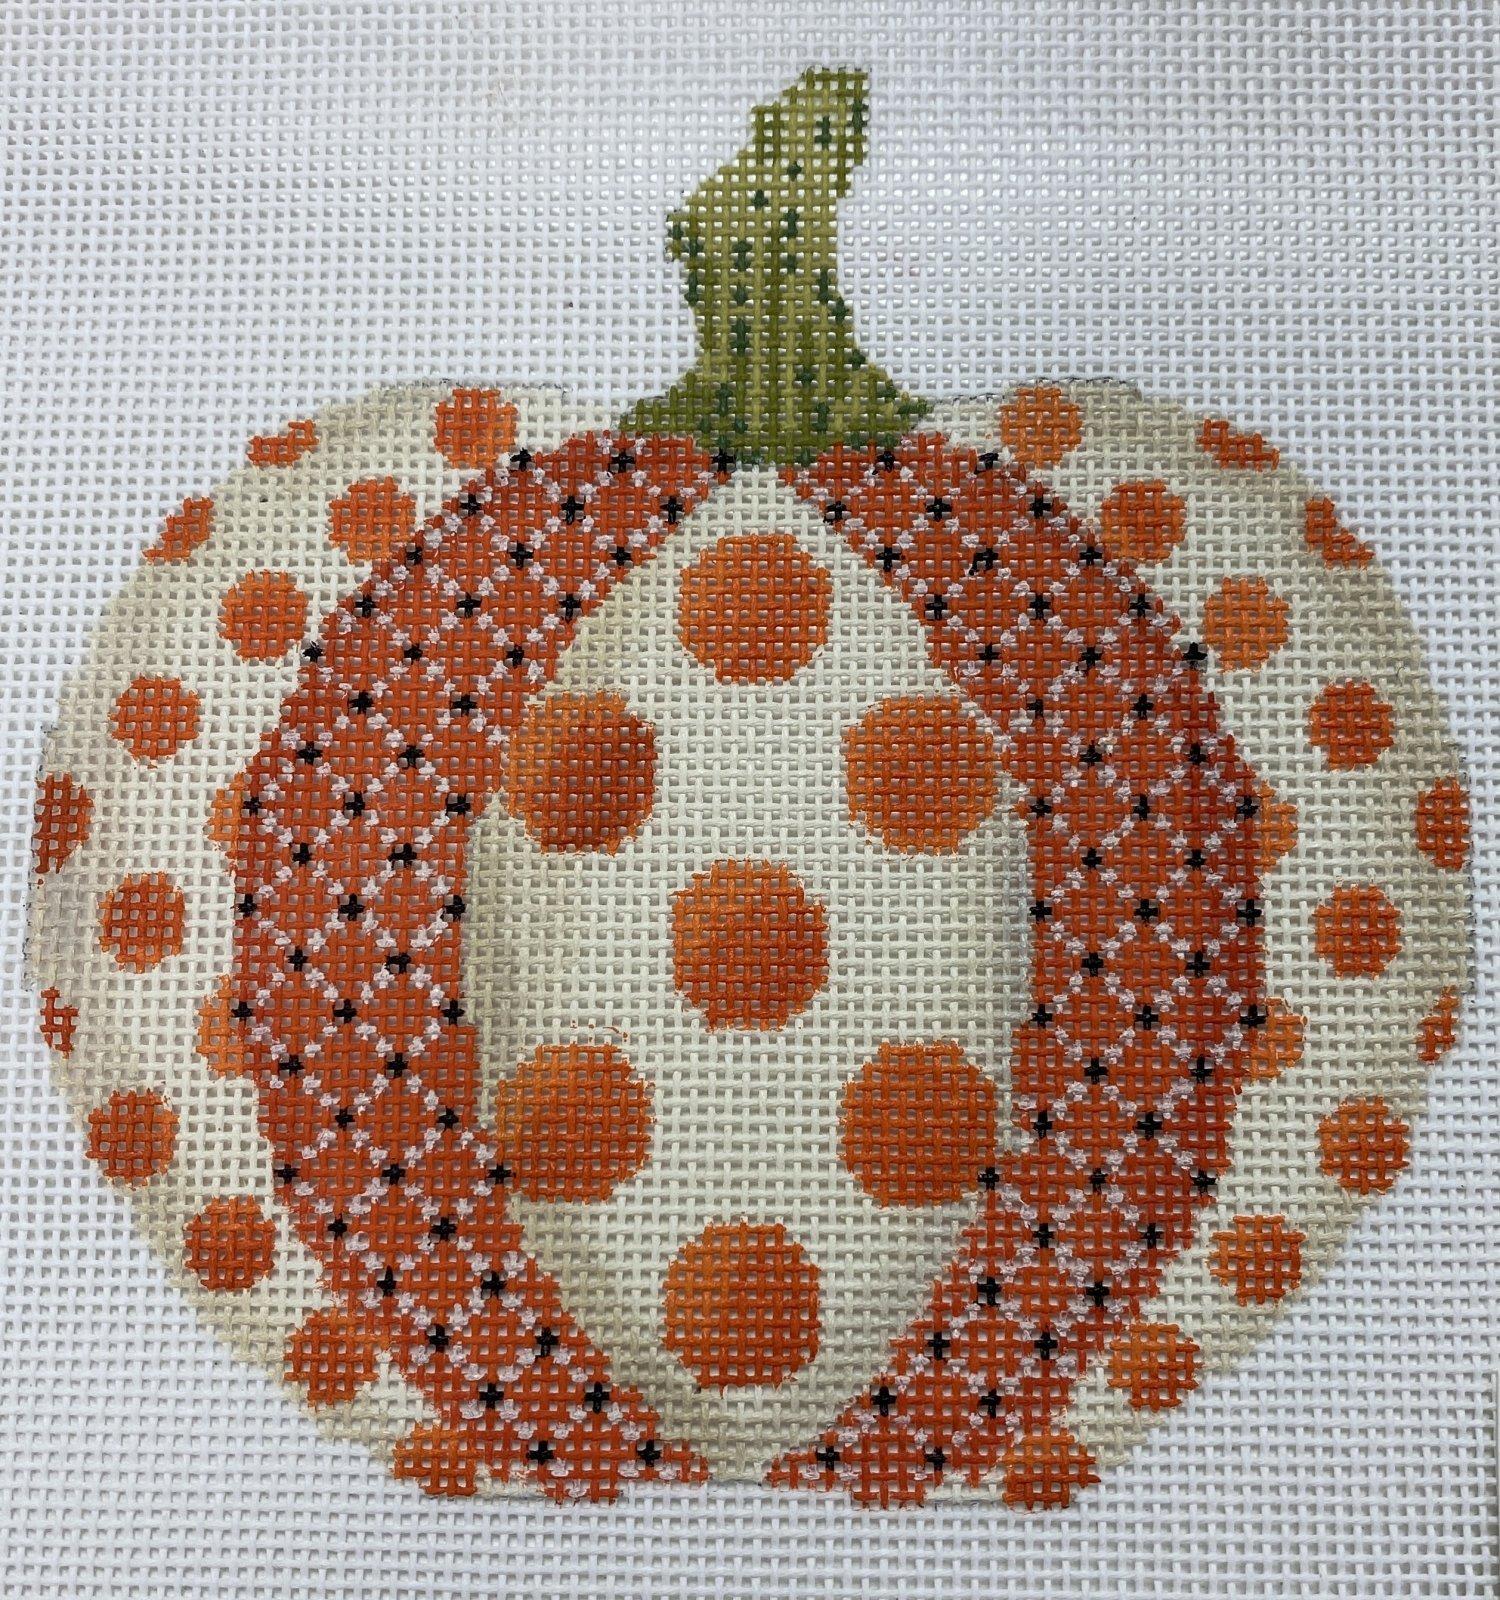 Polka Dot Patchwork Pumpkin,18 ct.,4.5x4.5